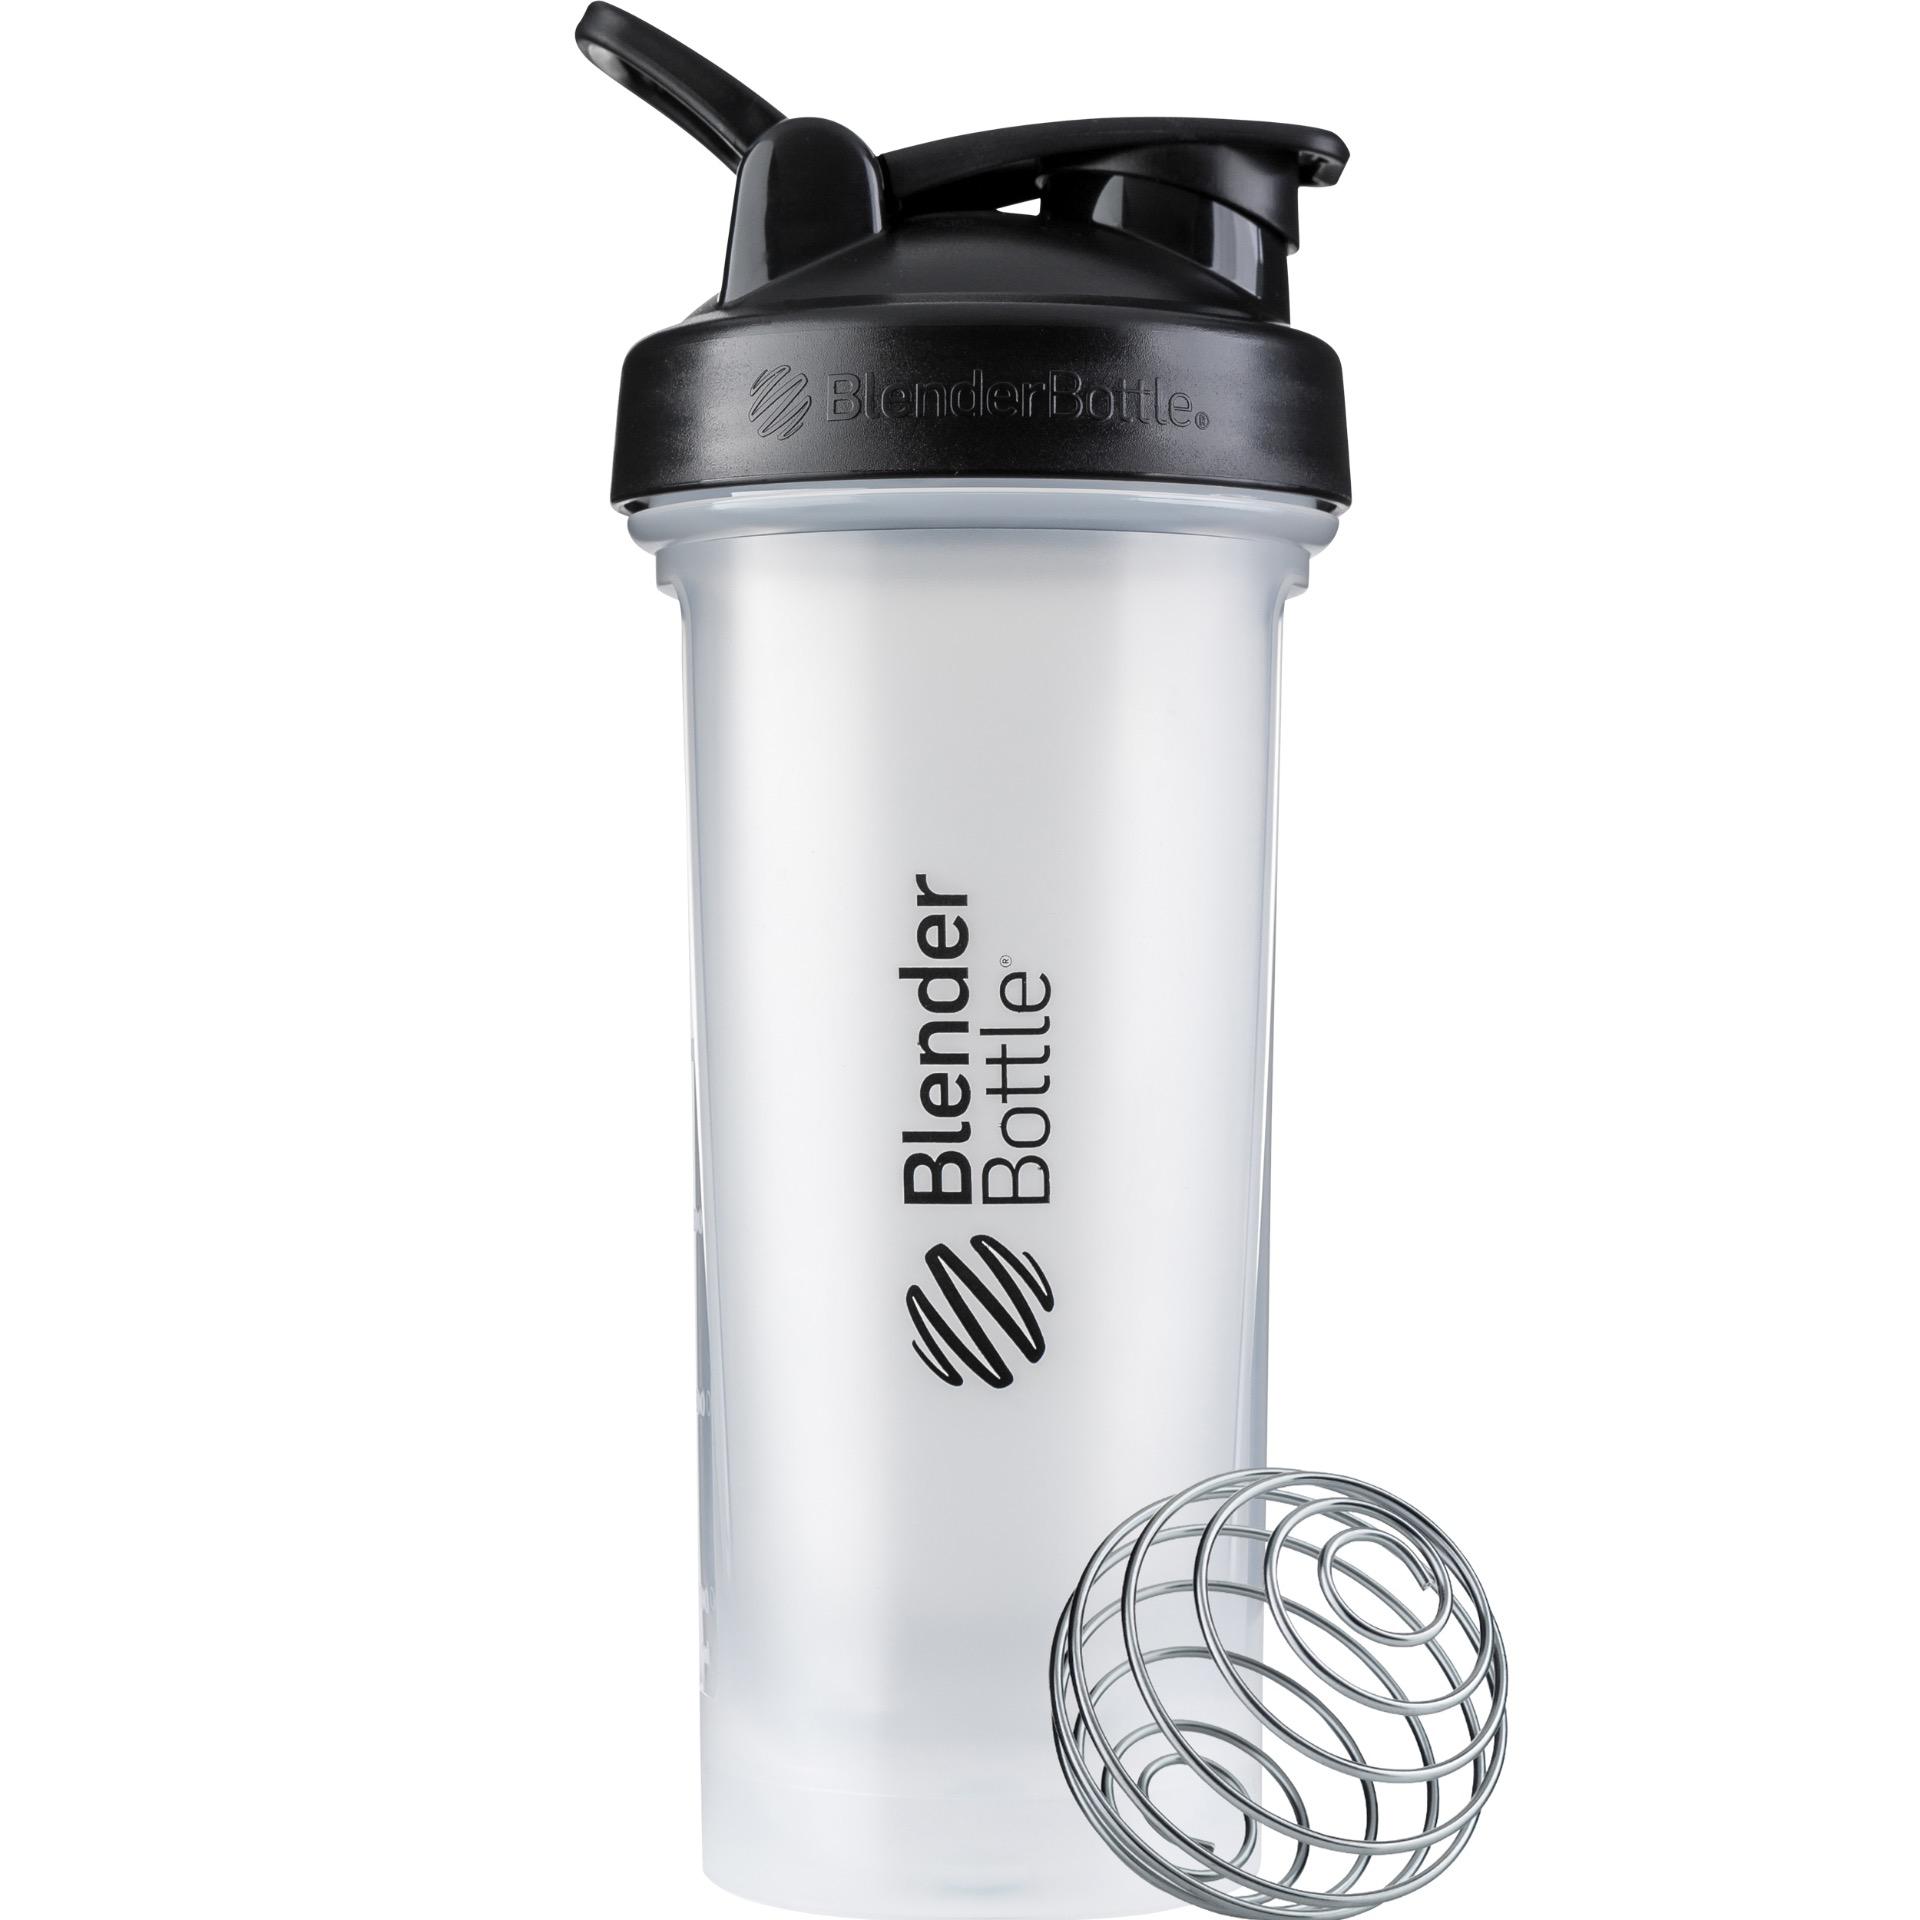 [Blender Bottle] 第2代Classic搖搖杯(830ml/28oz)-黑白